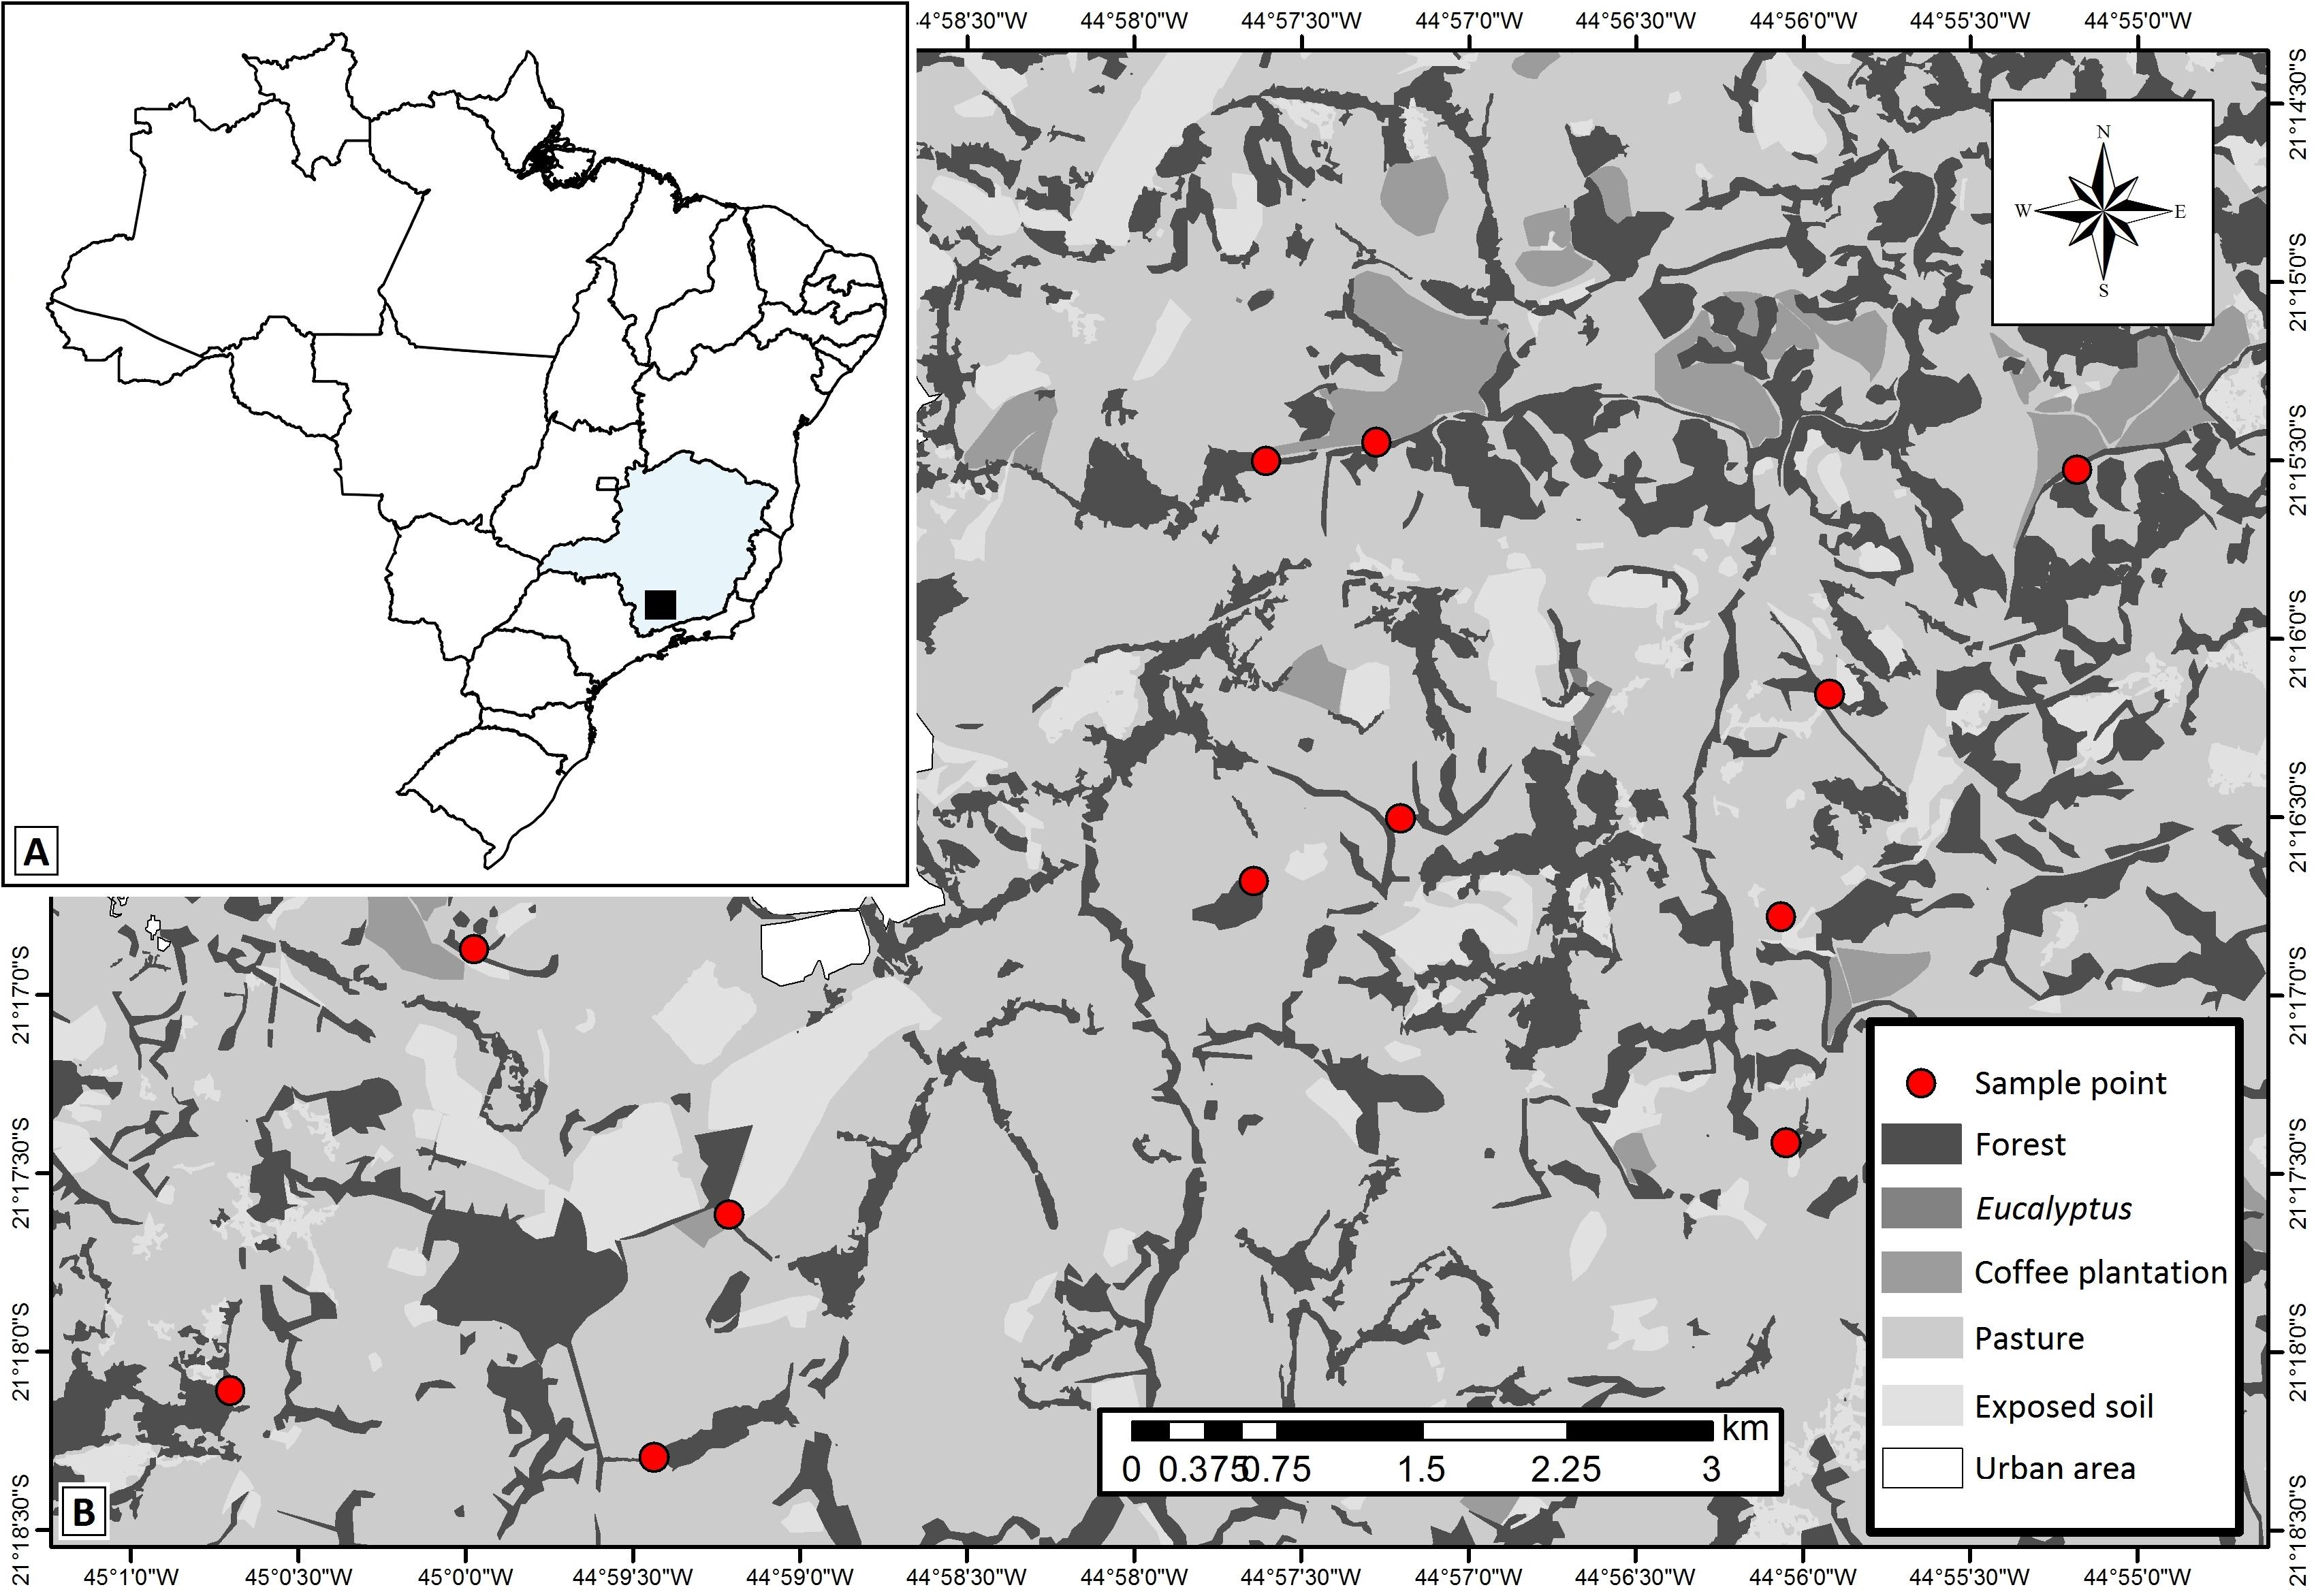 Variegated tropical landscapes conserve diverse dung beetle ...